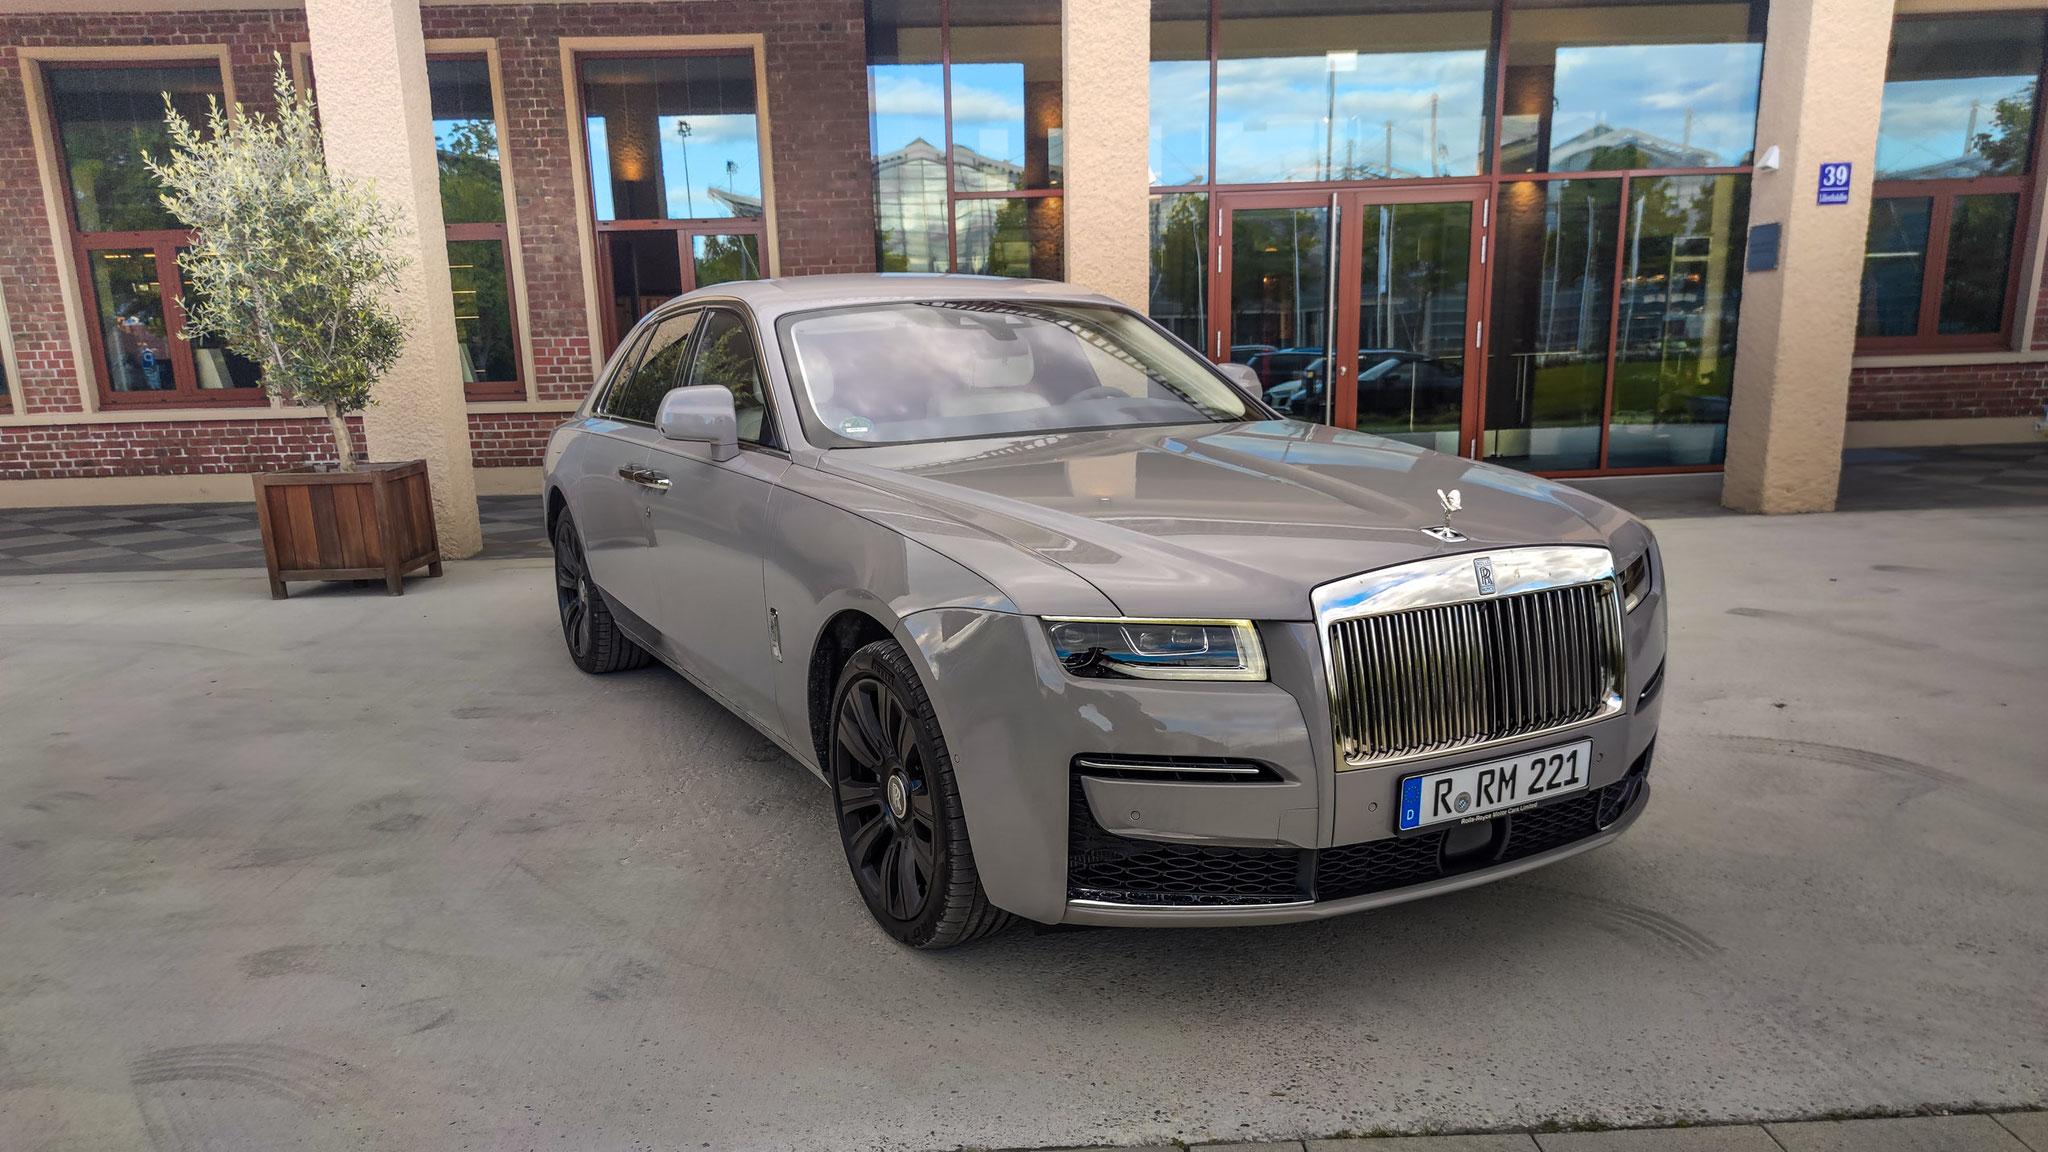 Rolls Royce Ghost - M-RM-221